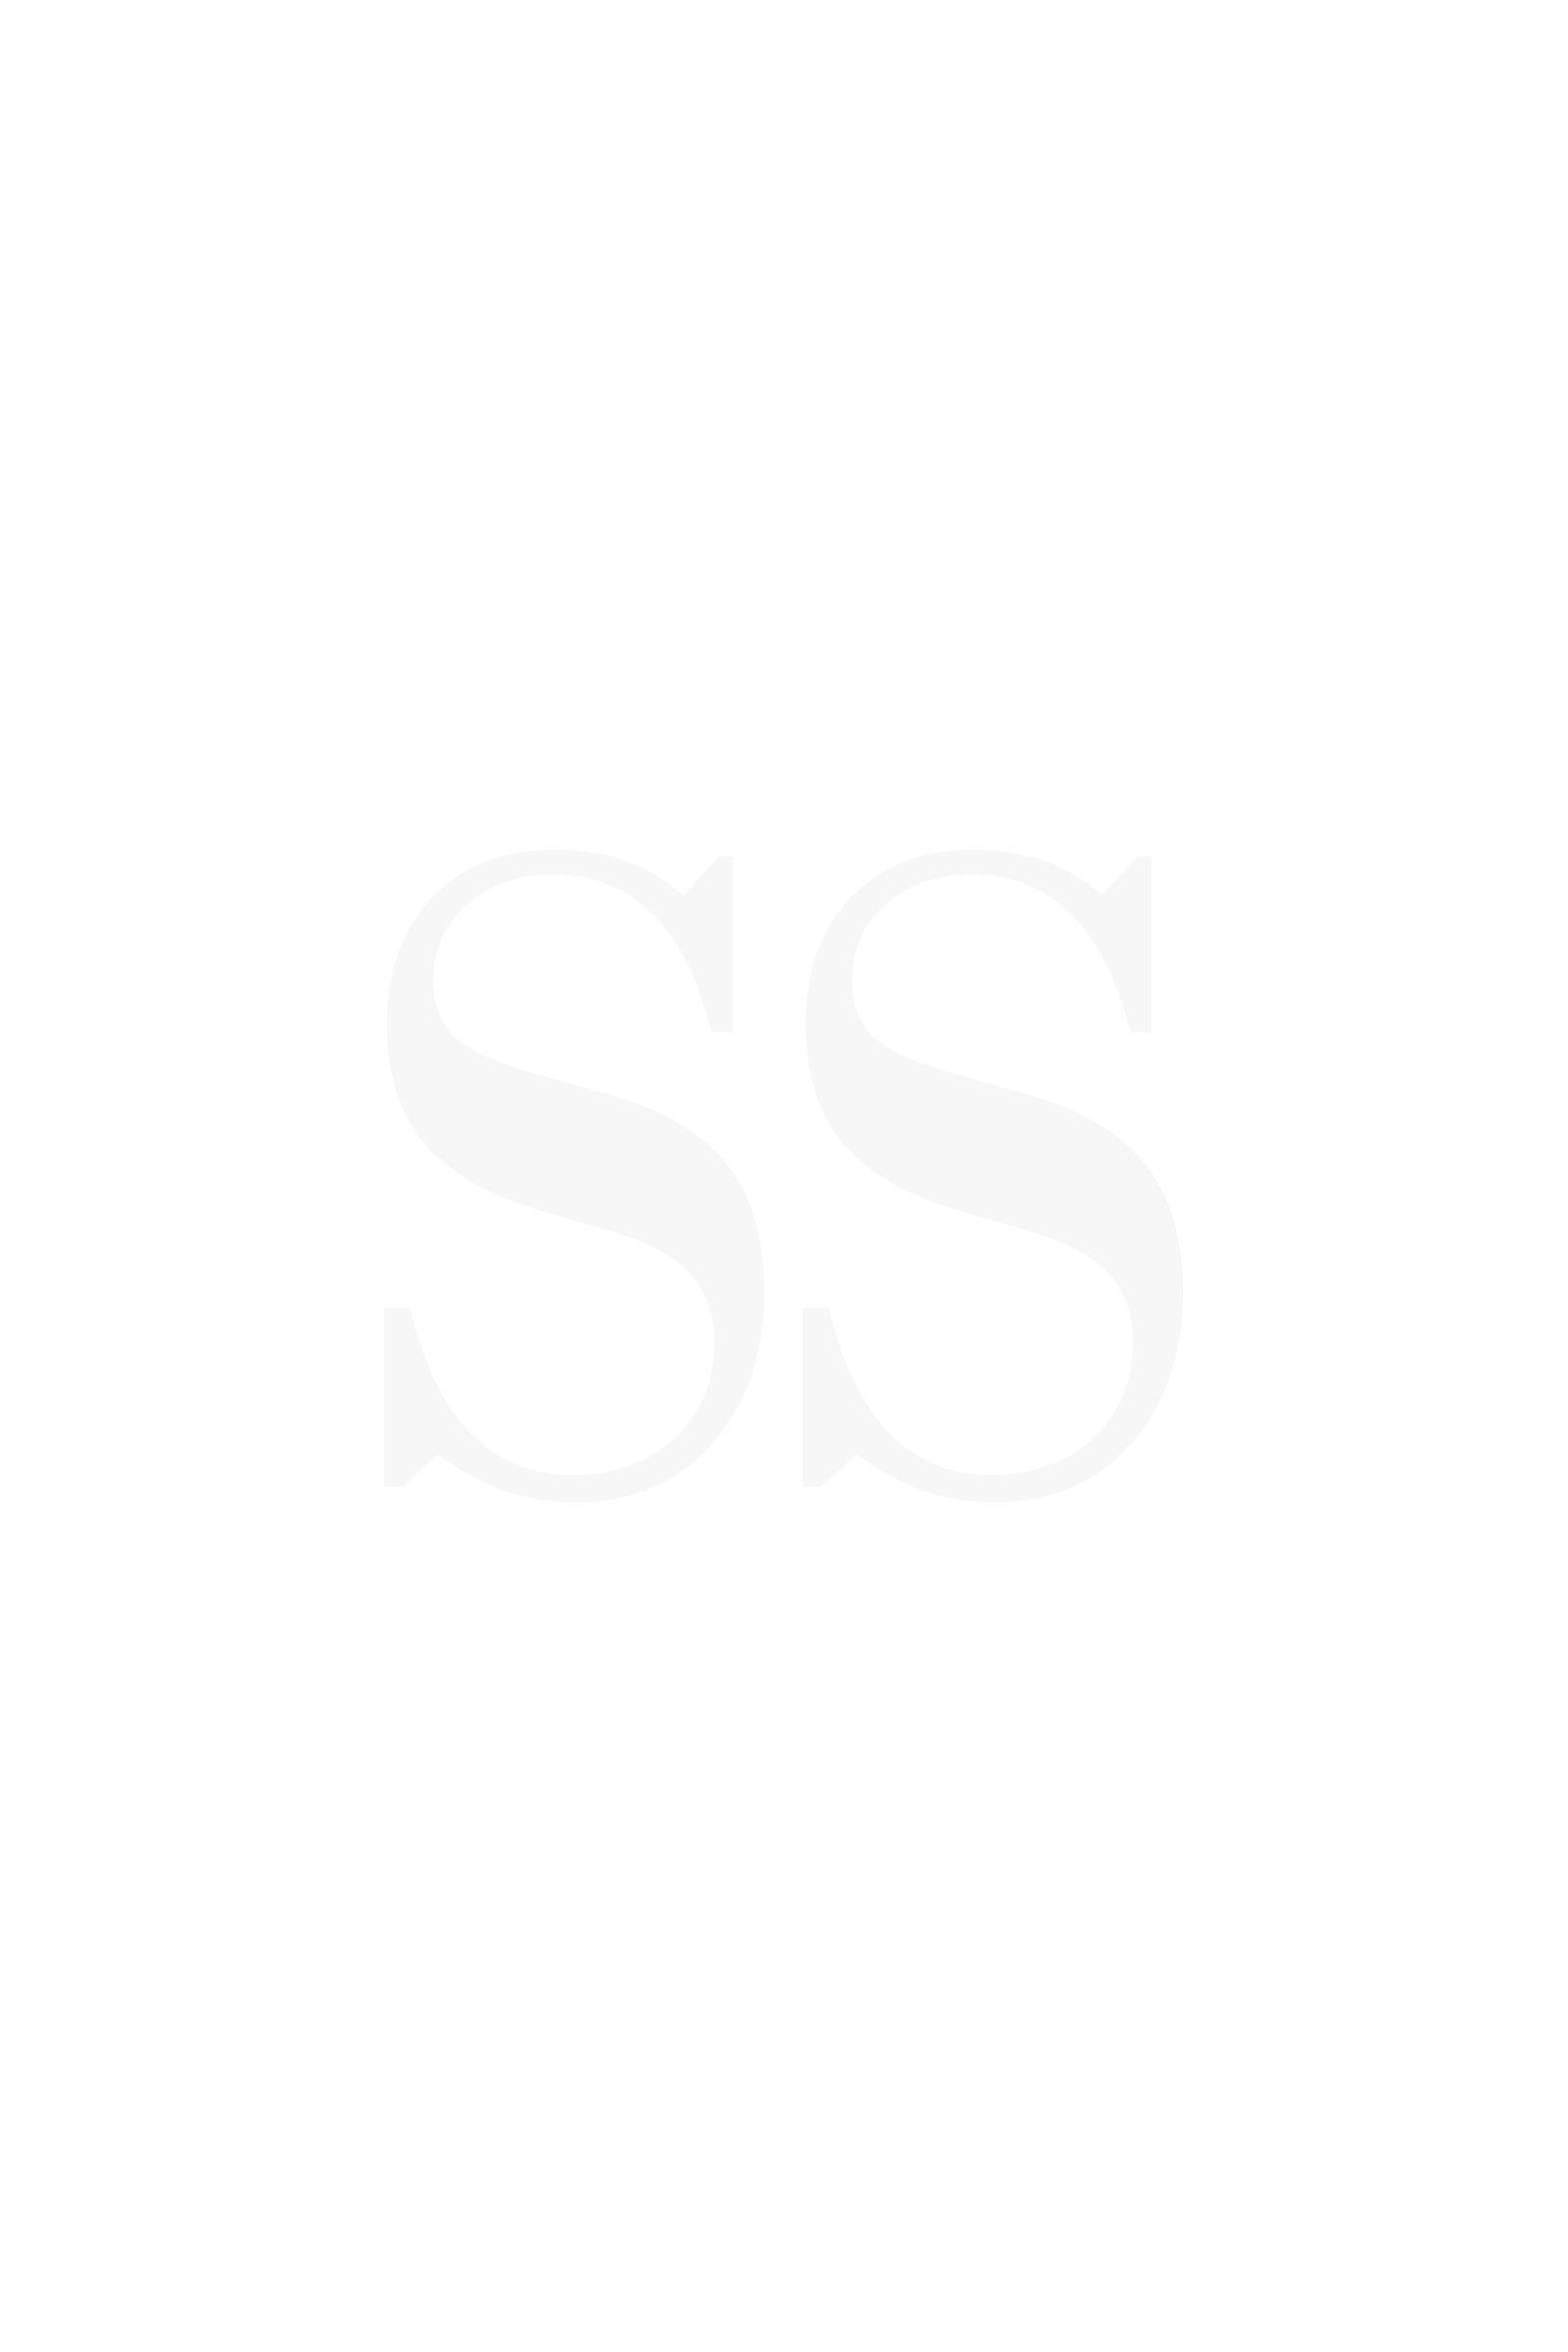 Sana Safinaz Online Design # 009B